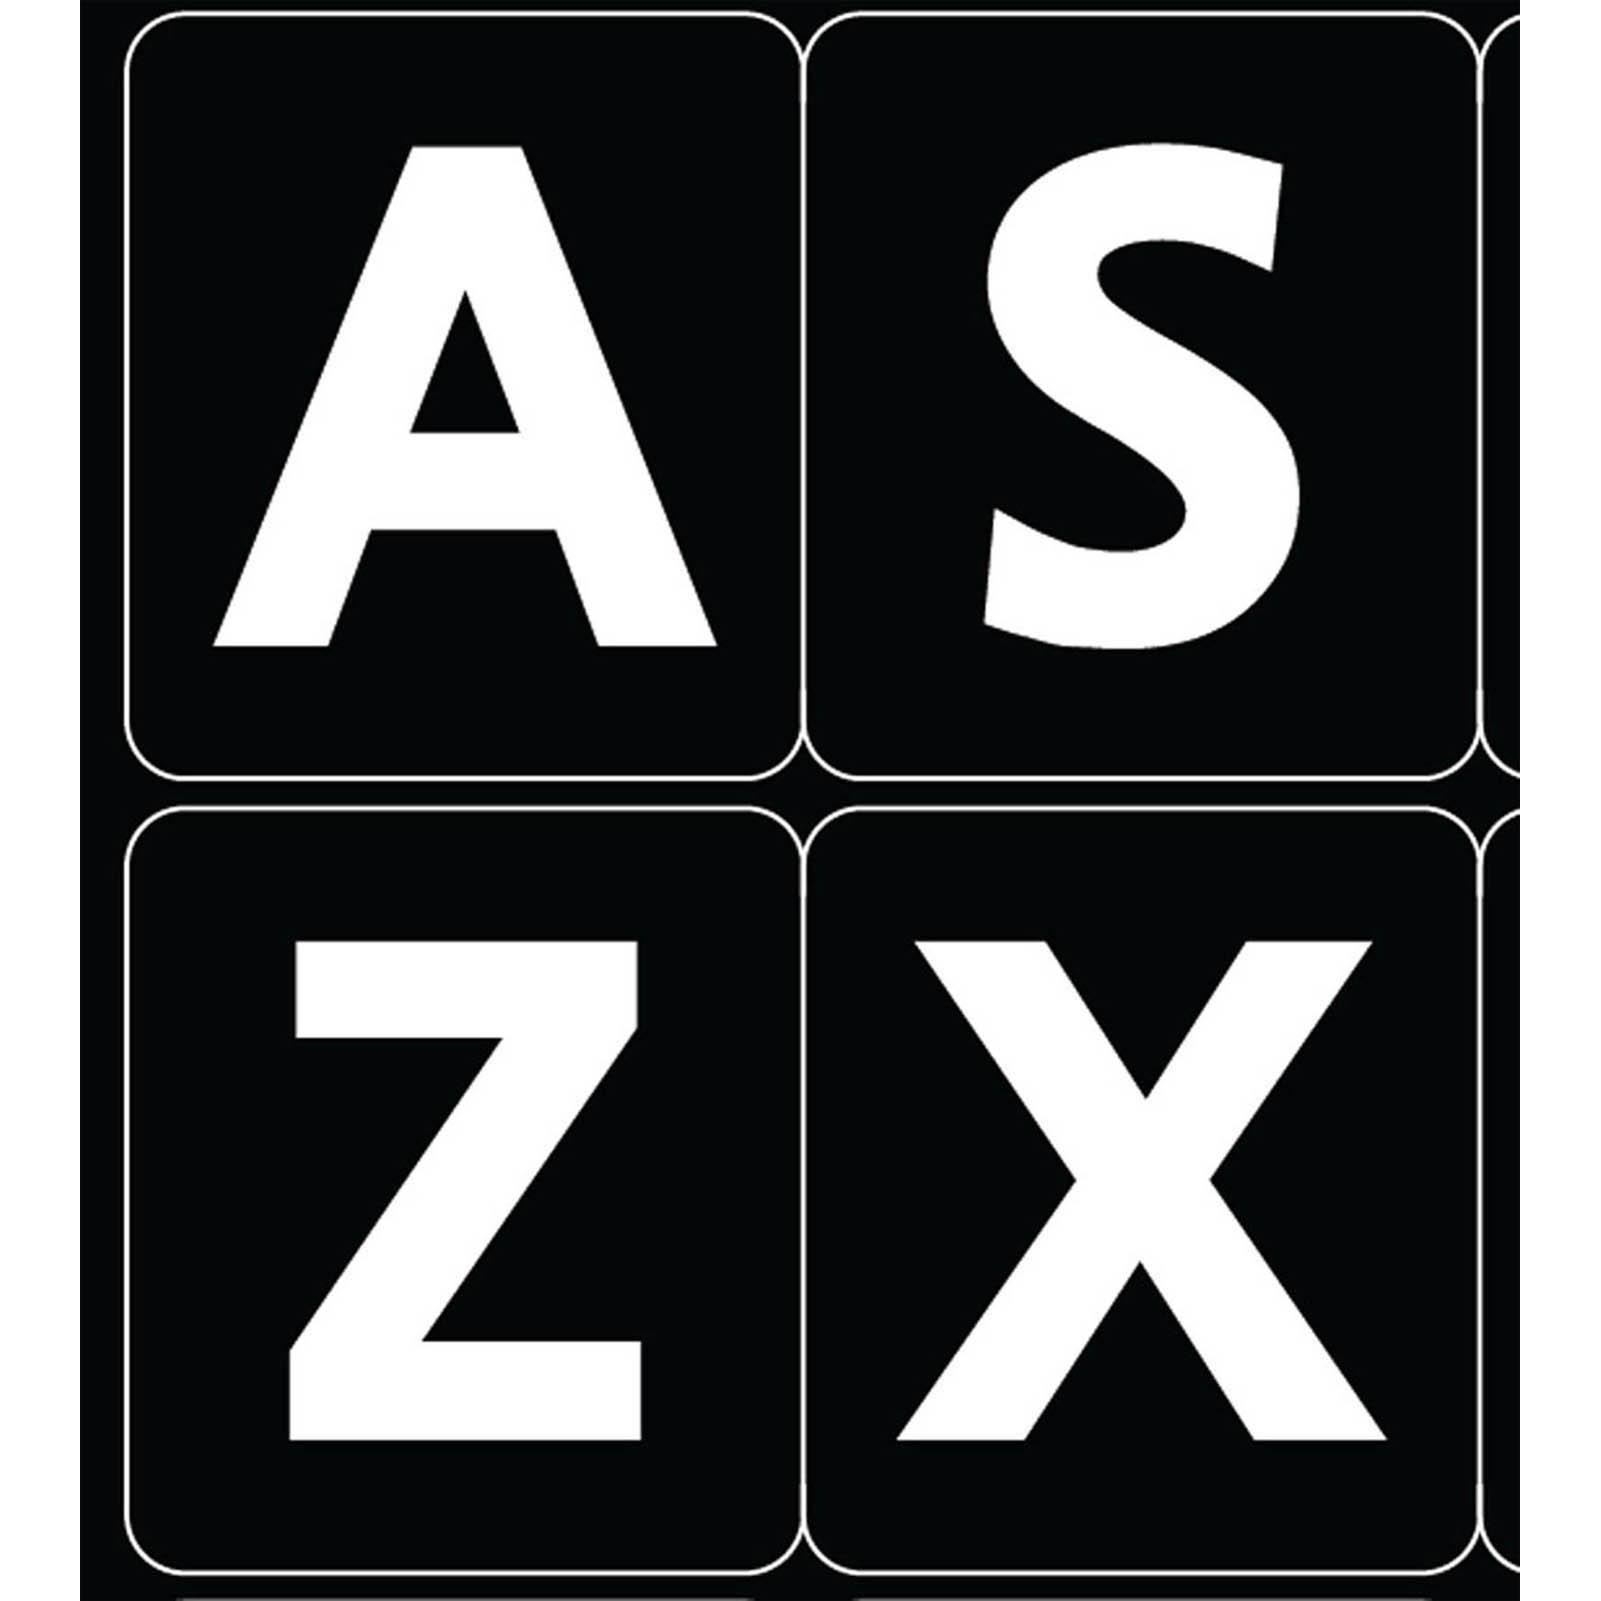 English uk large bold letters keyboard sticker black